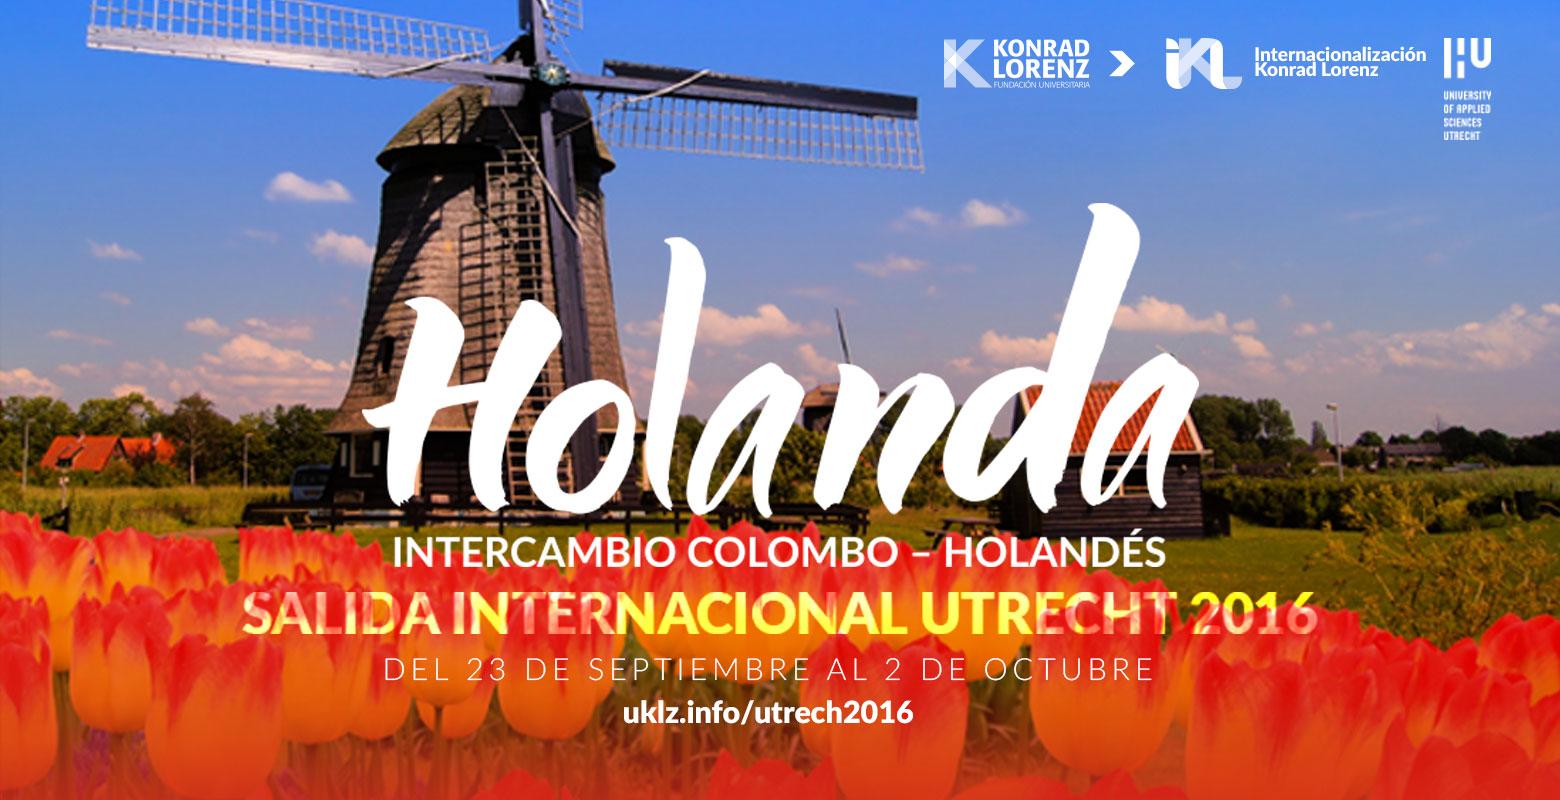 Salida Internacional Utrecht 2016. Países Bajos